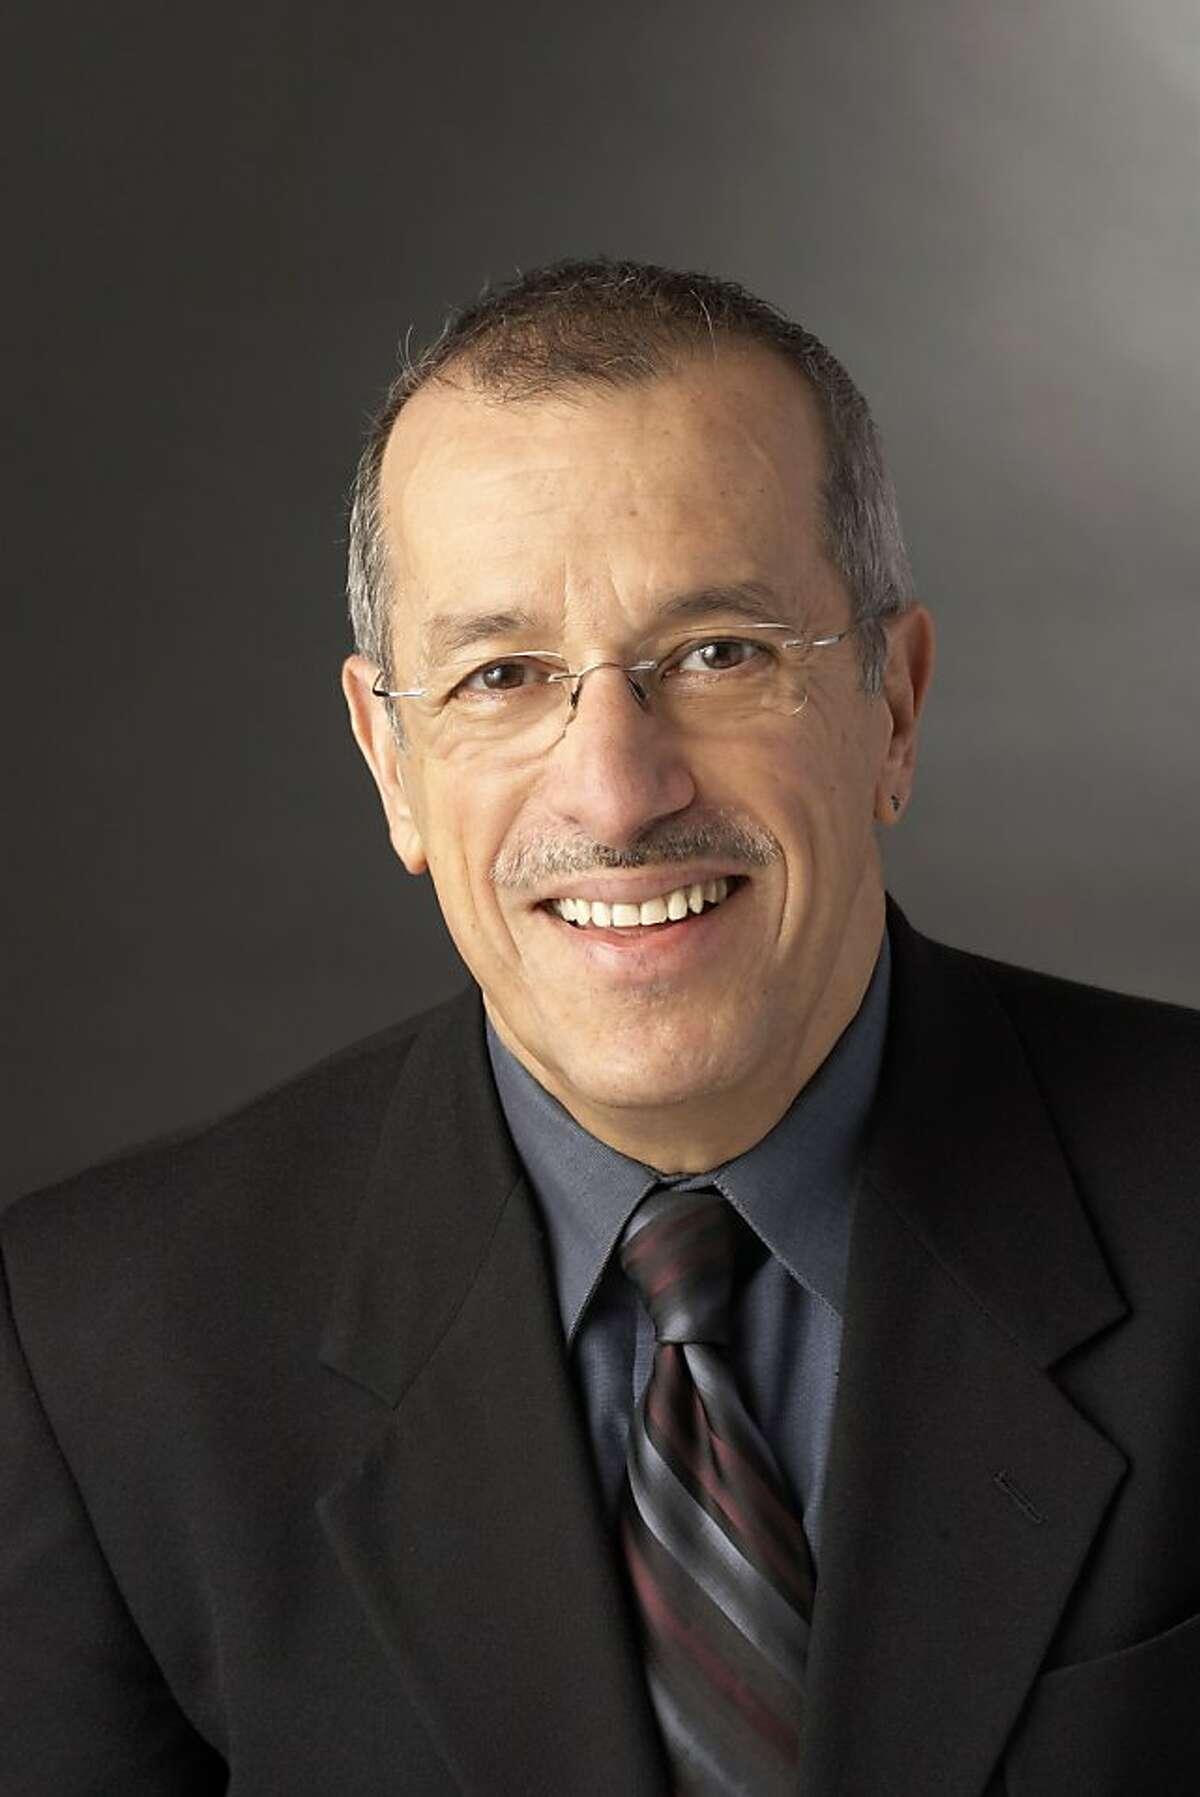 Raul Ramirez, executive director of news and public affairs at KQED radio